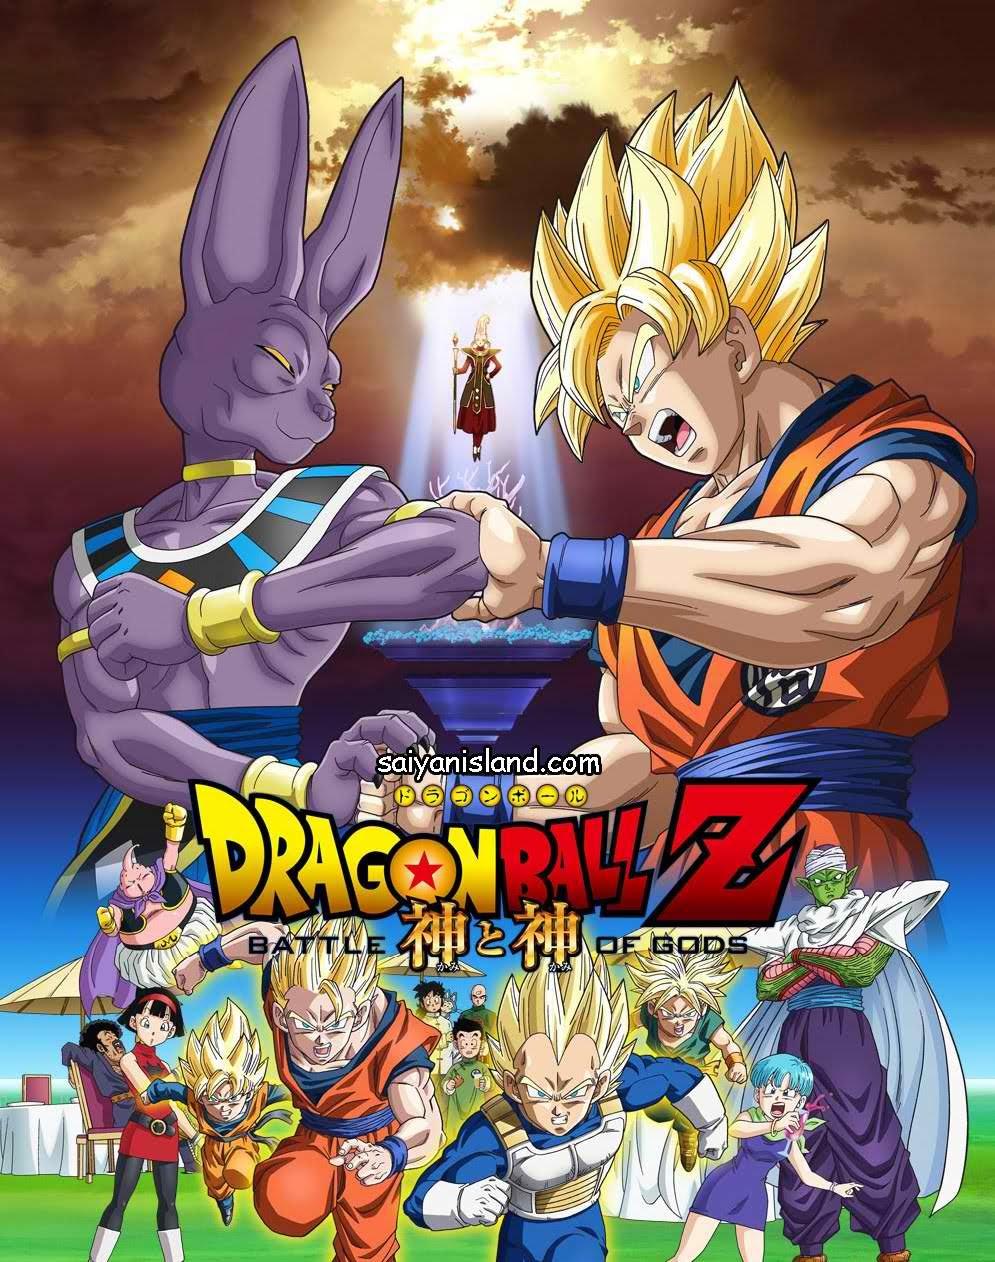 DBZ: Battle of Gods movie official poster